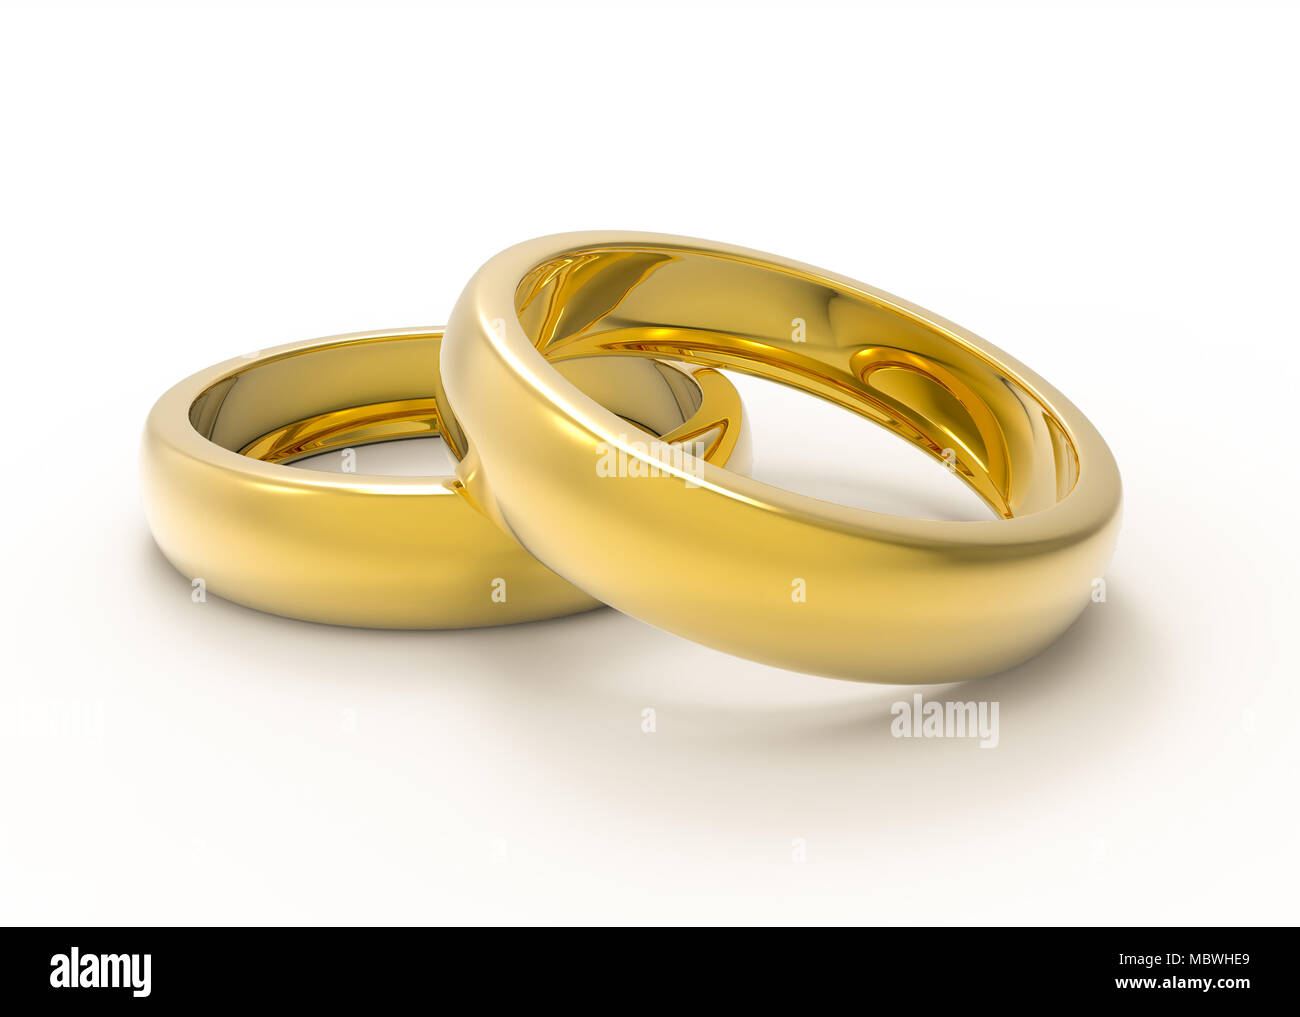 Golden Wedding rings on reflecting white table 3D illustration